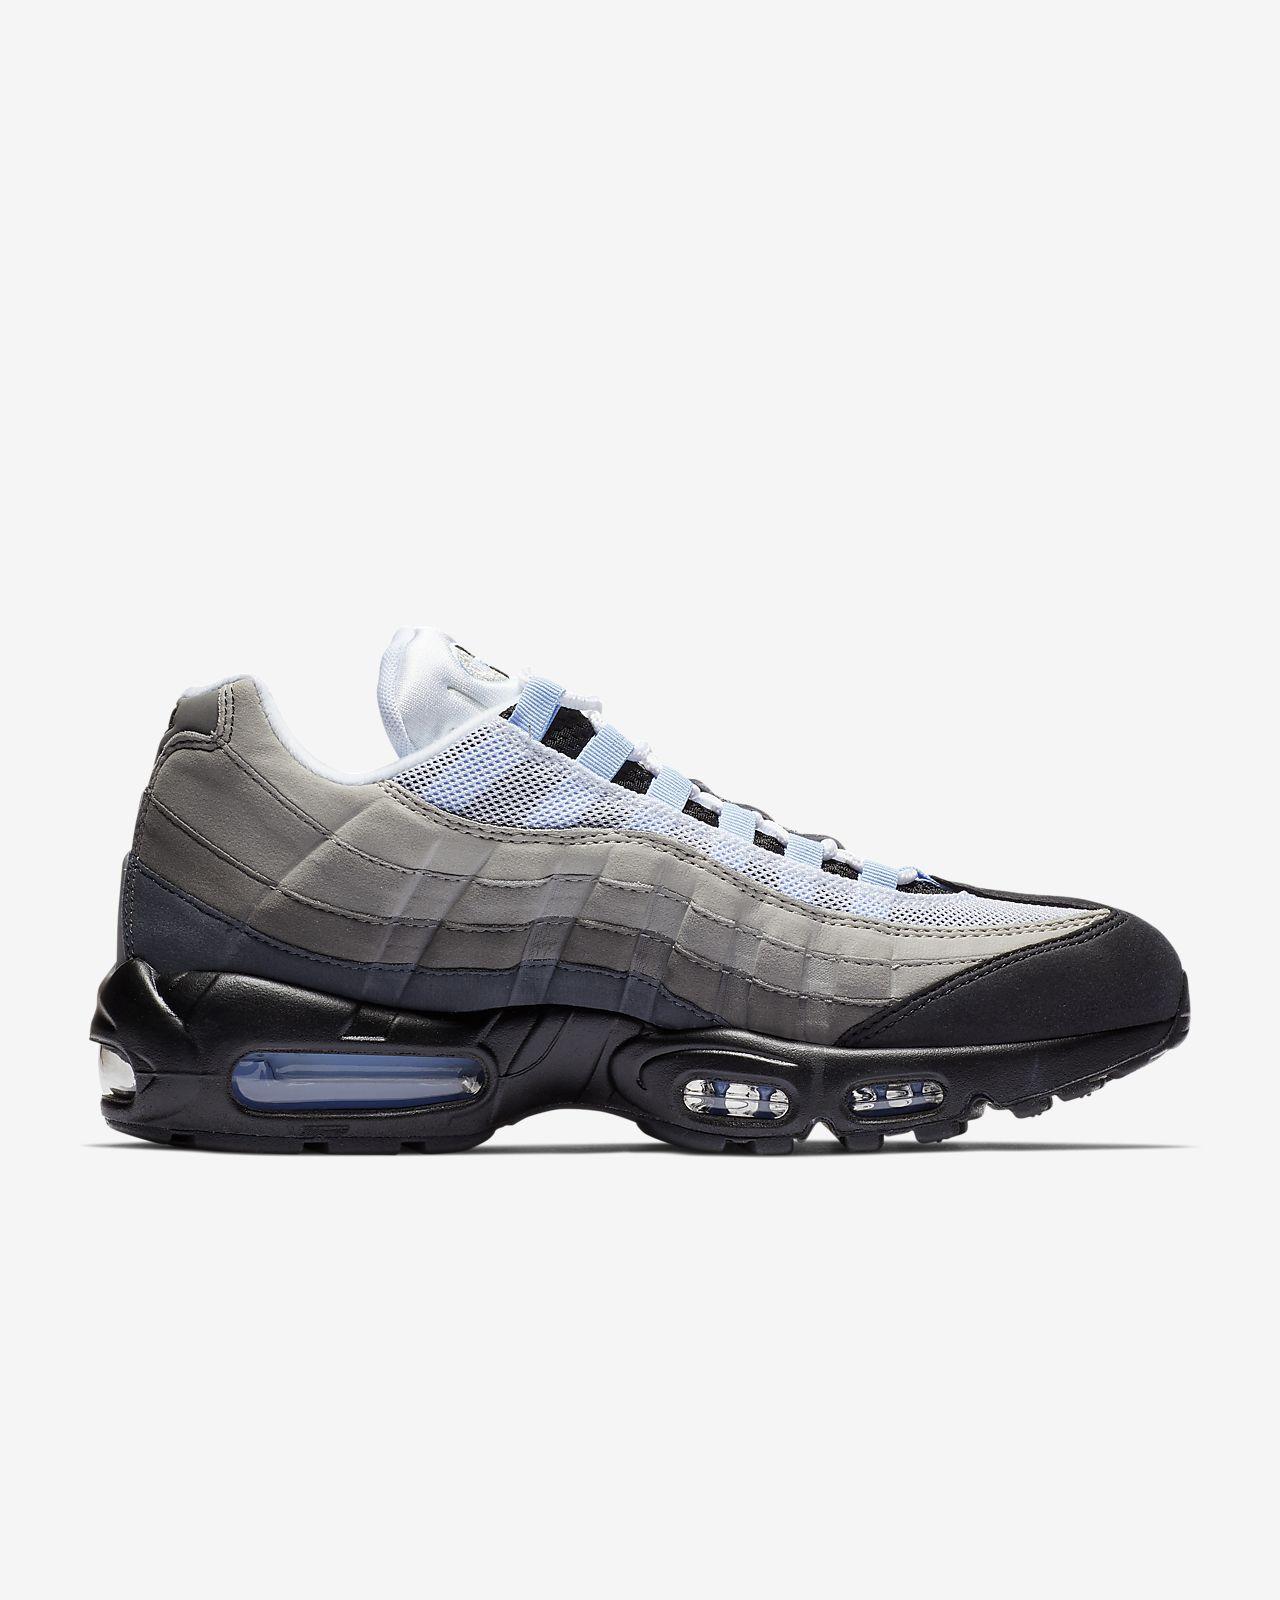 5843fea823 Nike Air Max 95 Men's Shoe. Nike.com ZA